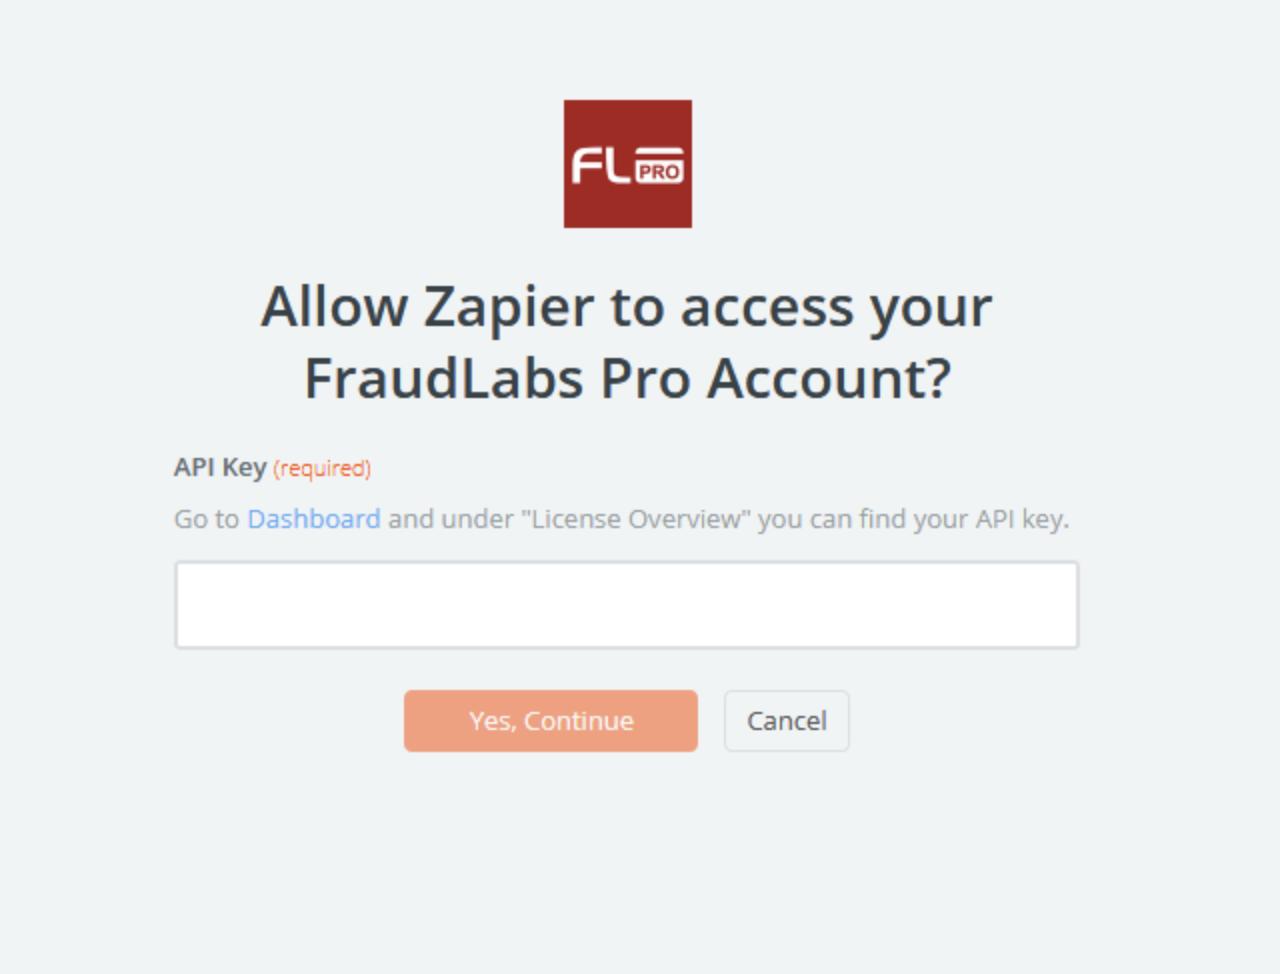 FraudLabs Pro API Key